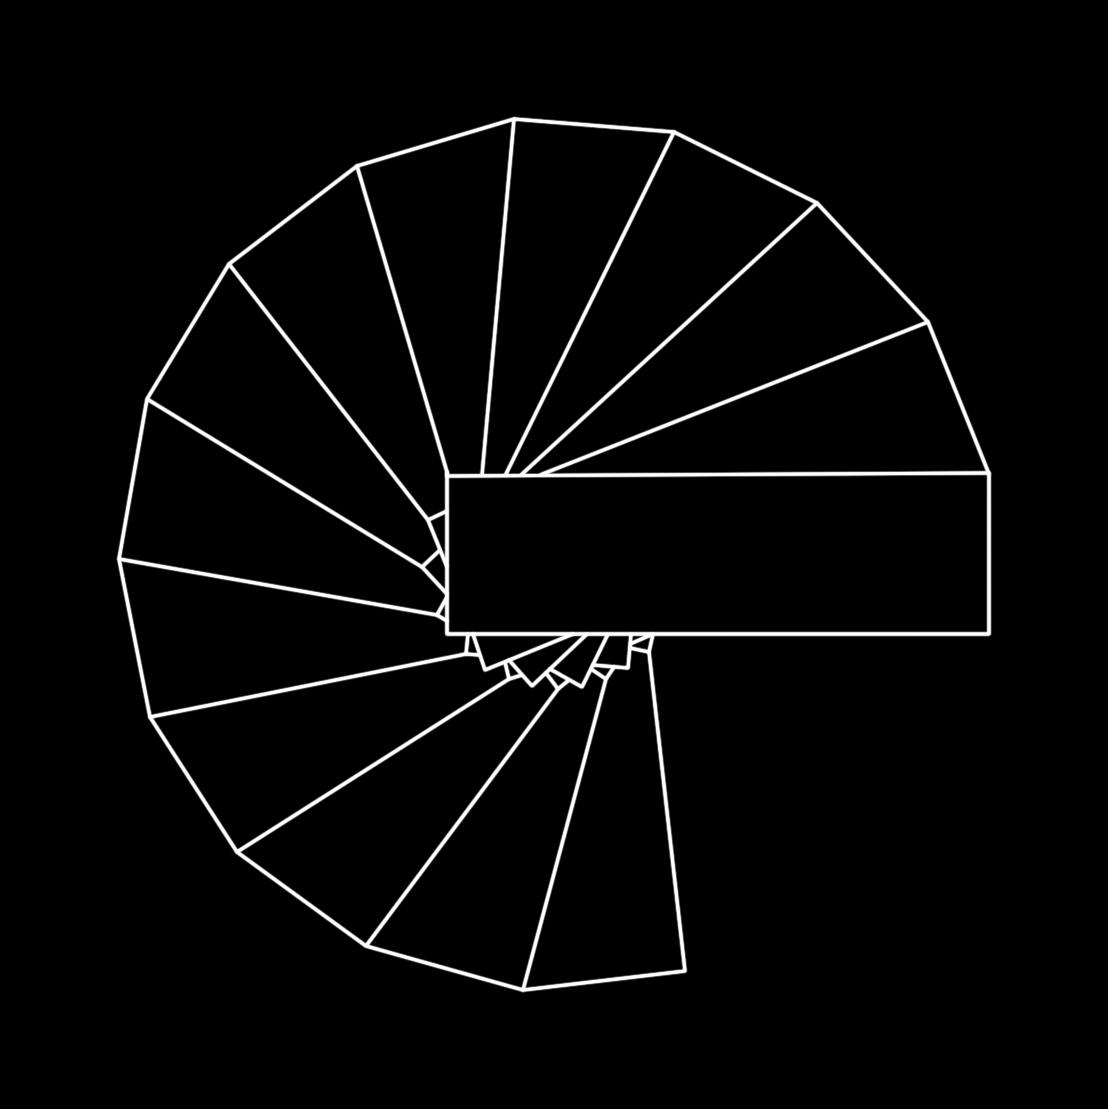 Endless's logo